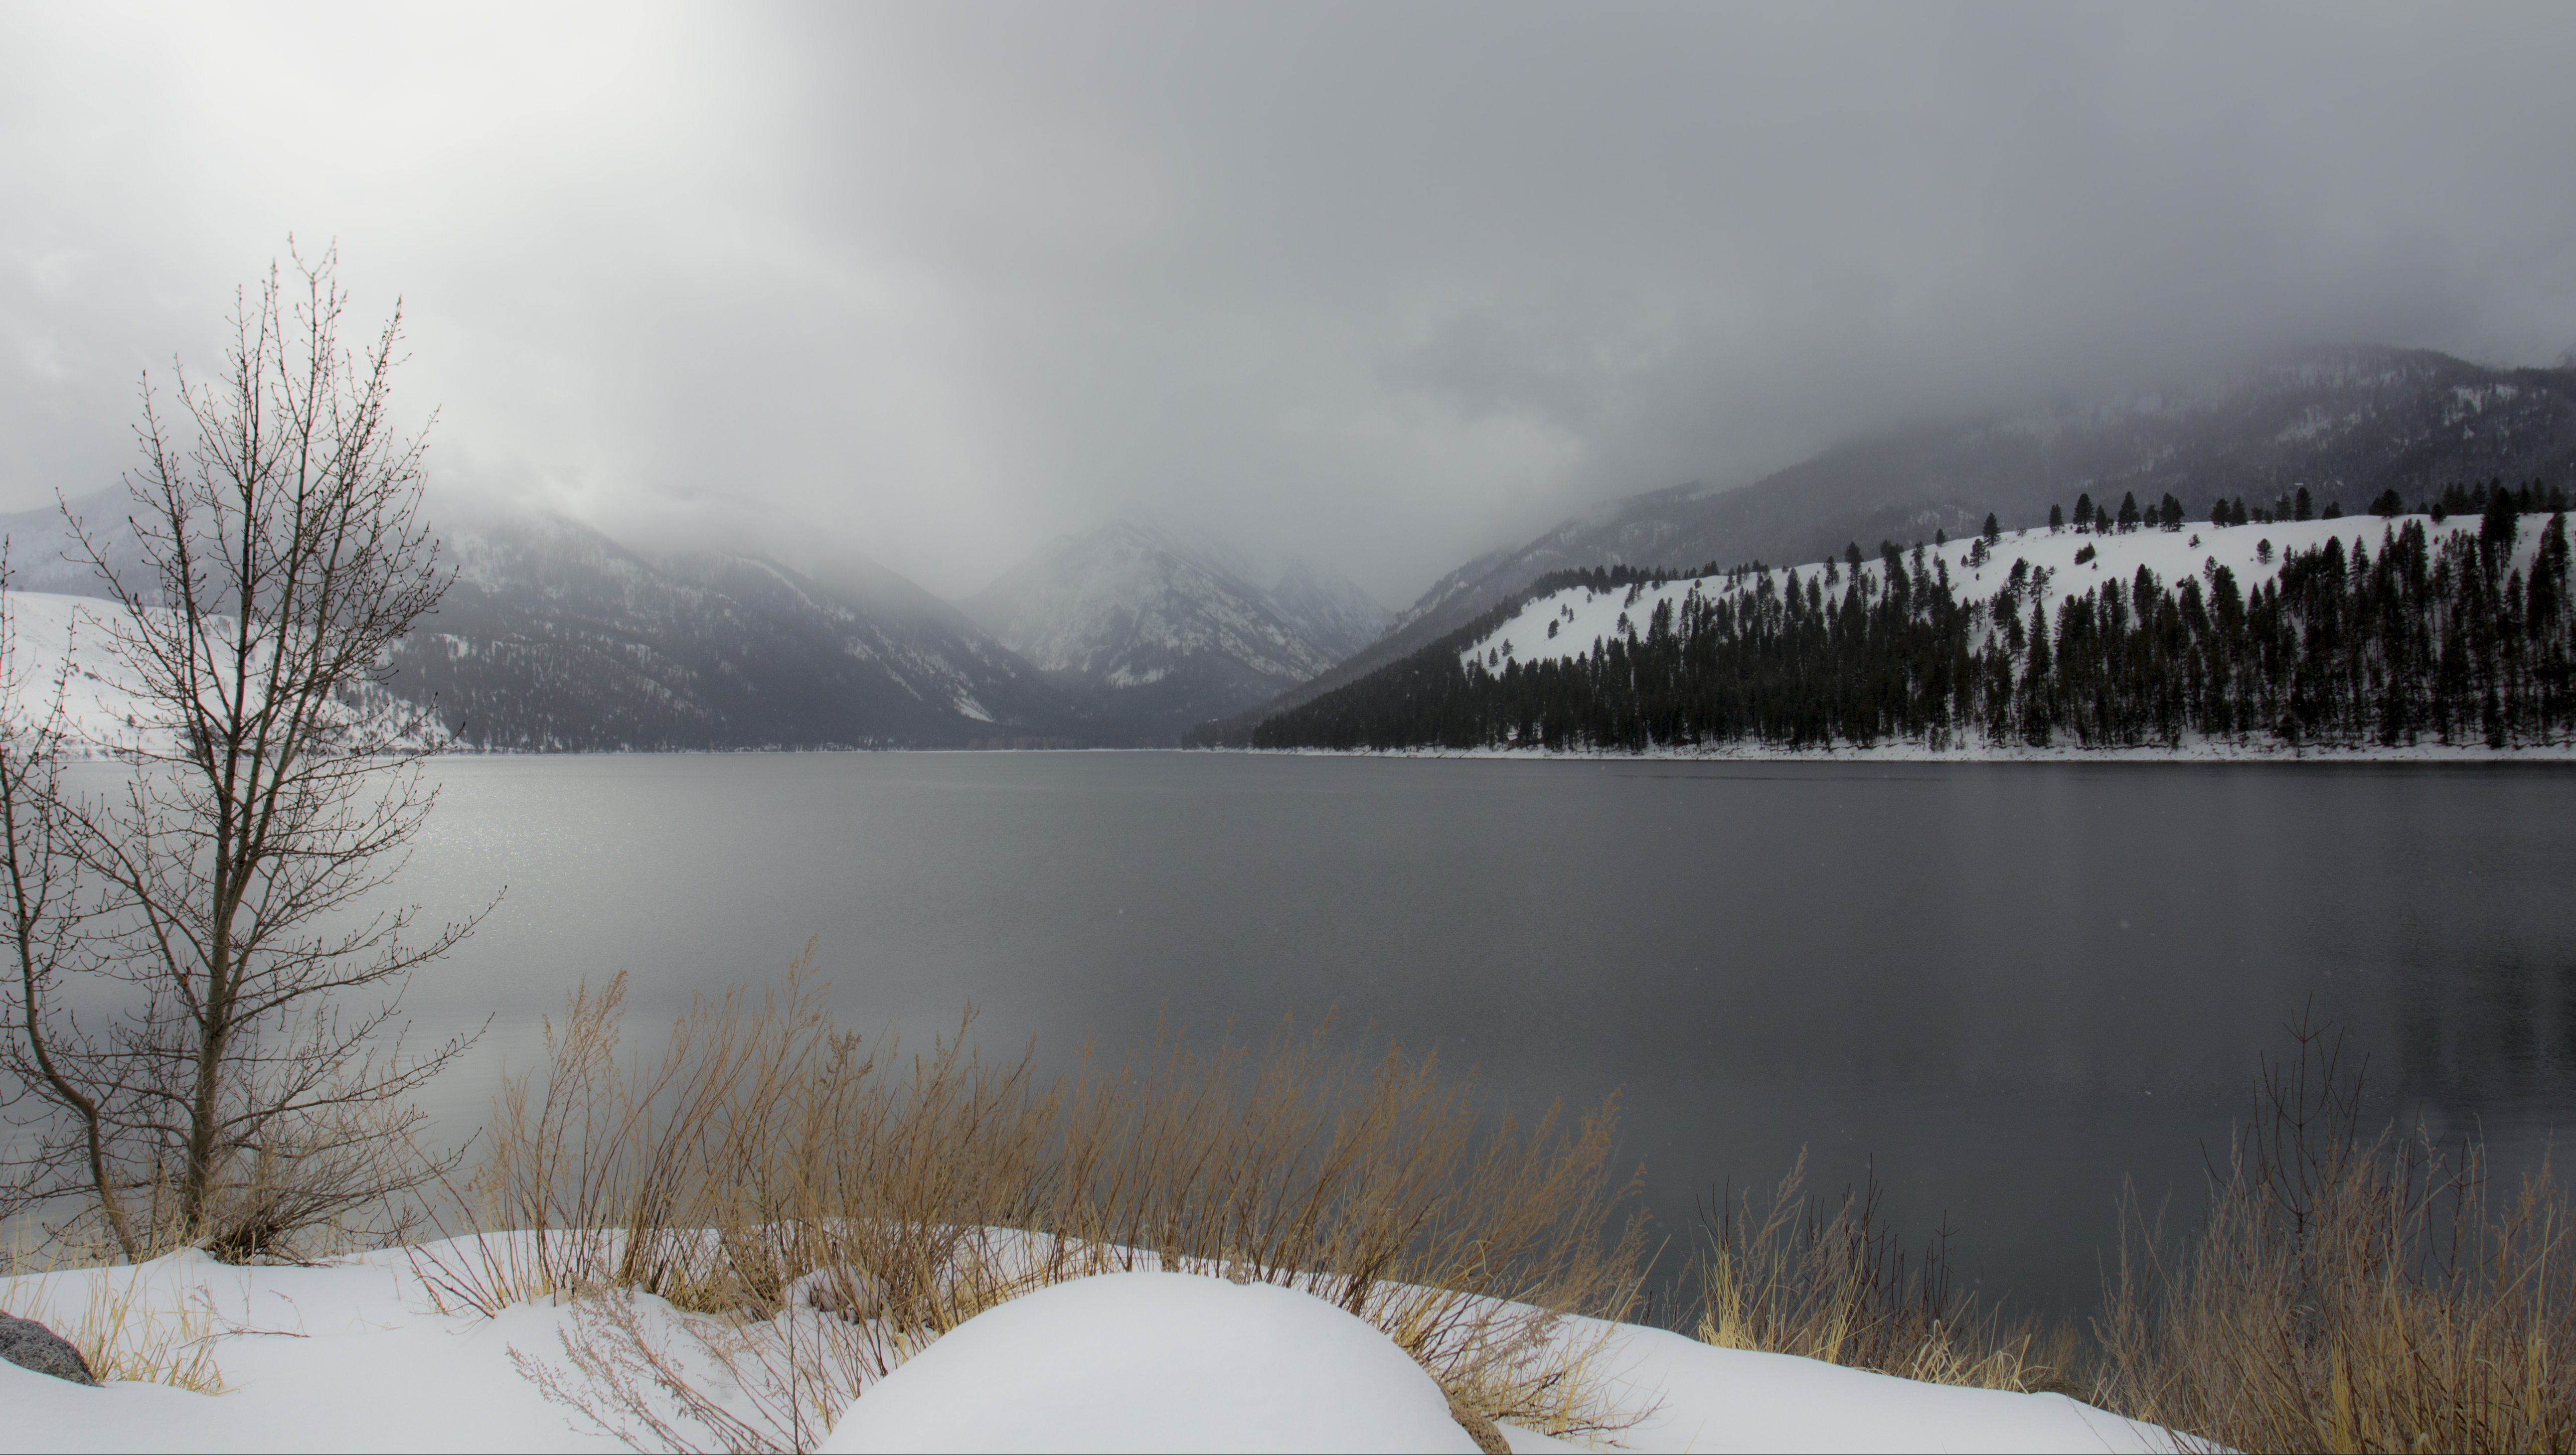 Snow storm moving across wallowa lake, oregon photo